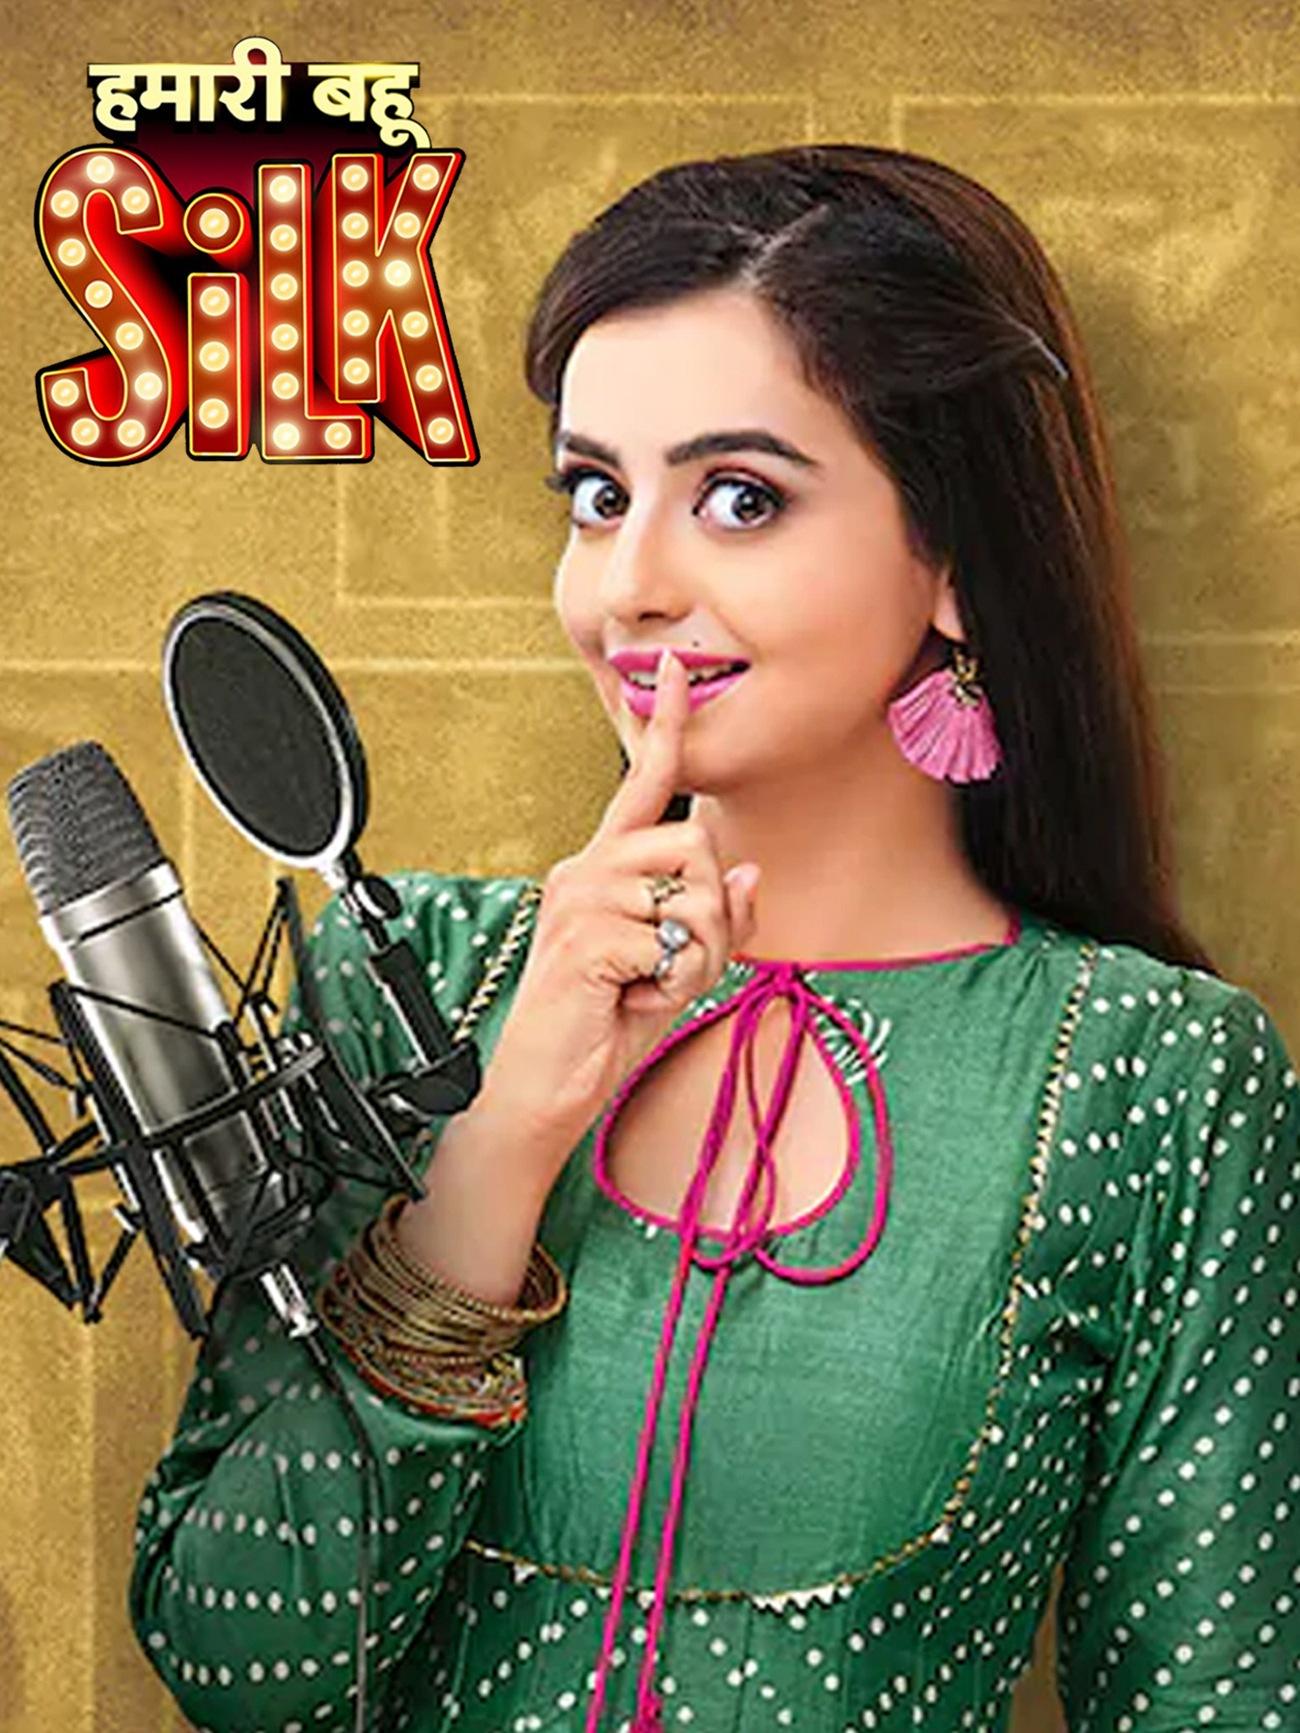 Humari-Bahu-Silk-tv-show-zee-tv-tv-stars-news-online